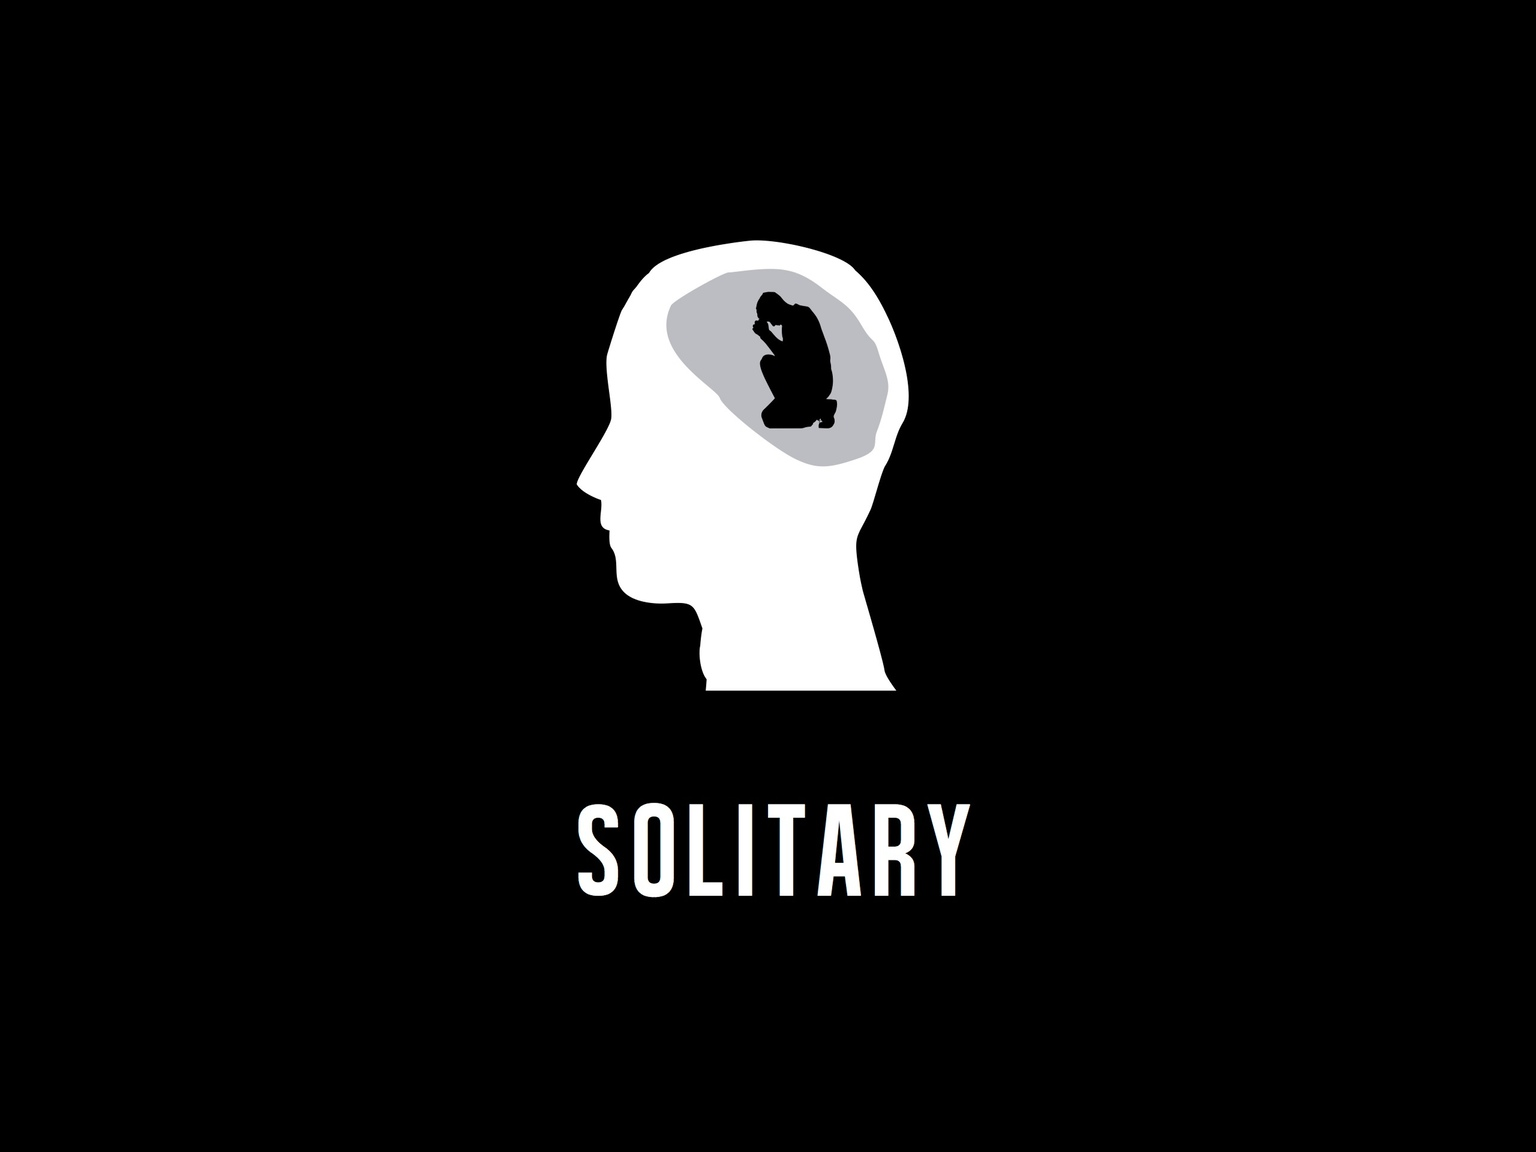 solitary-poster-photo-original.jpg